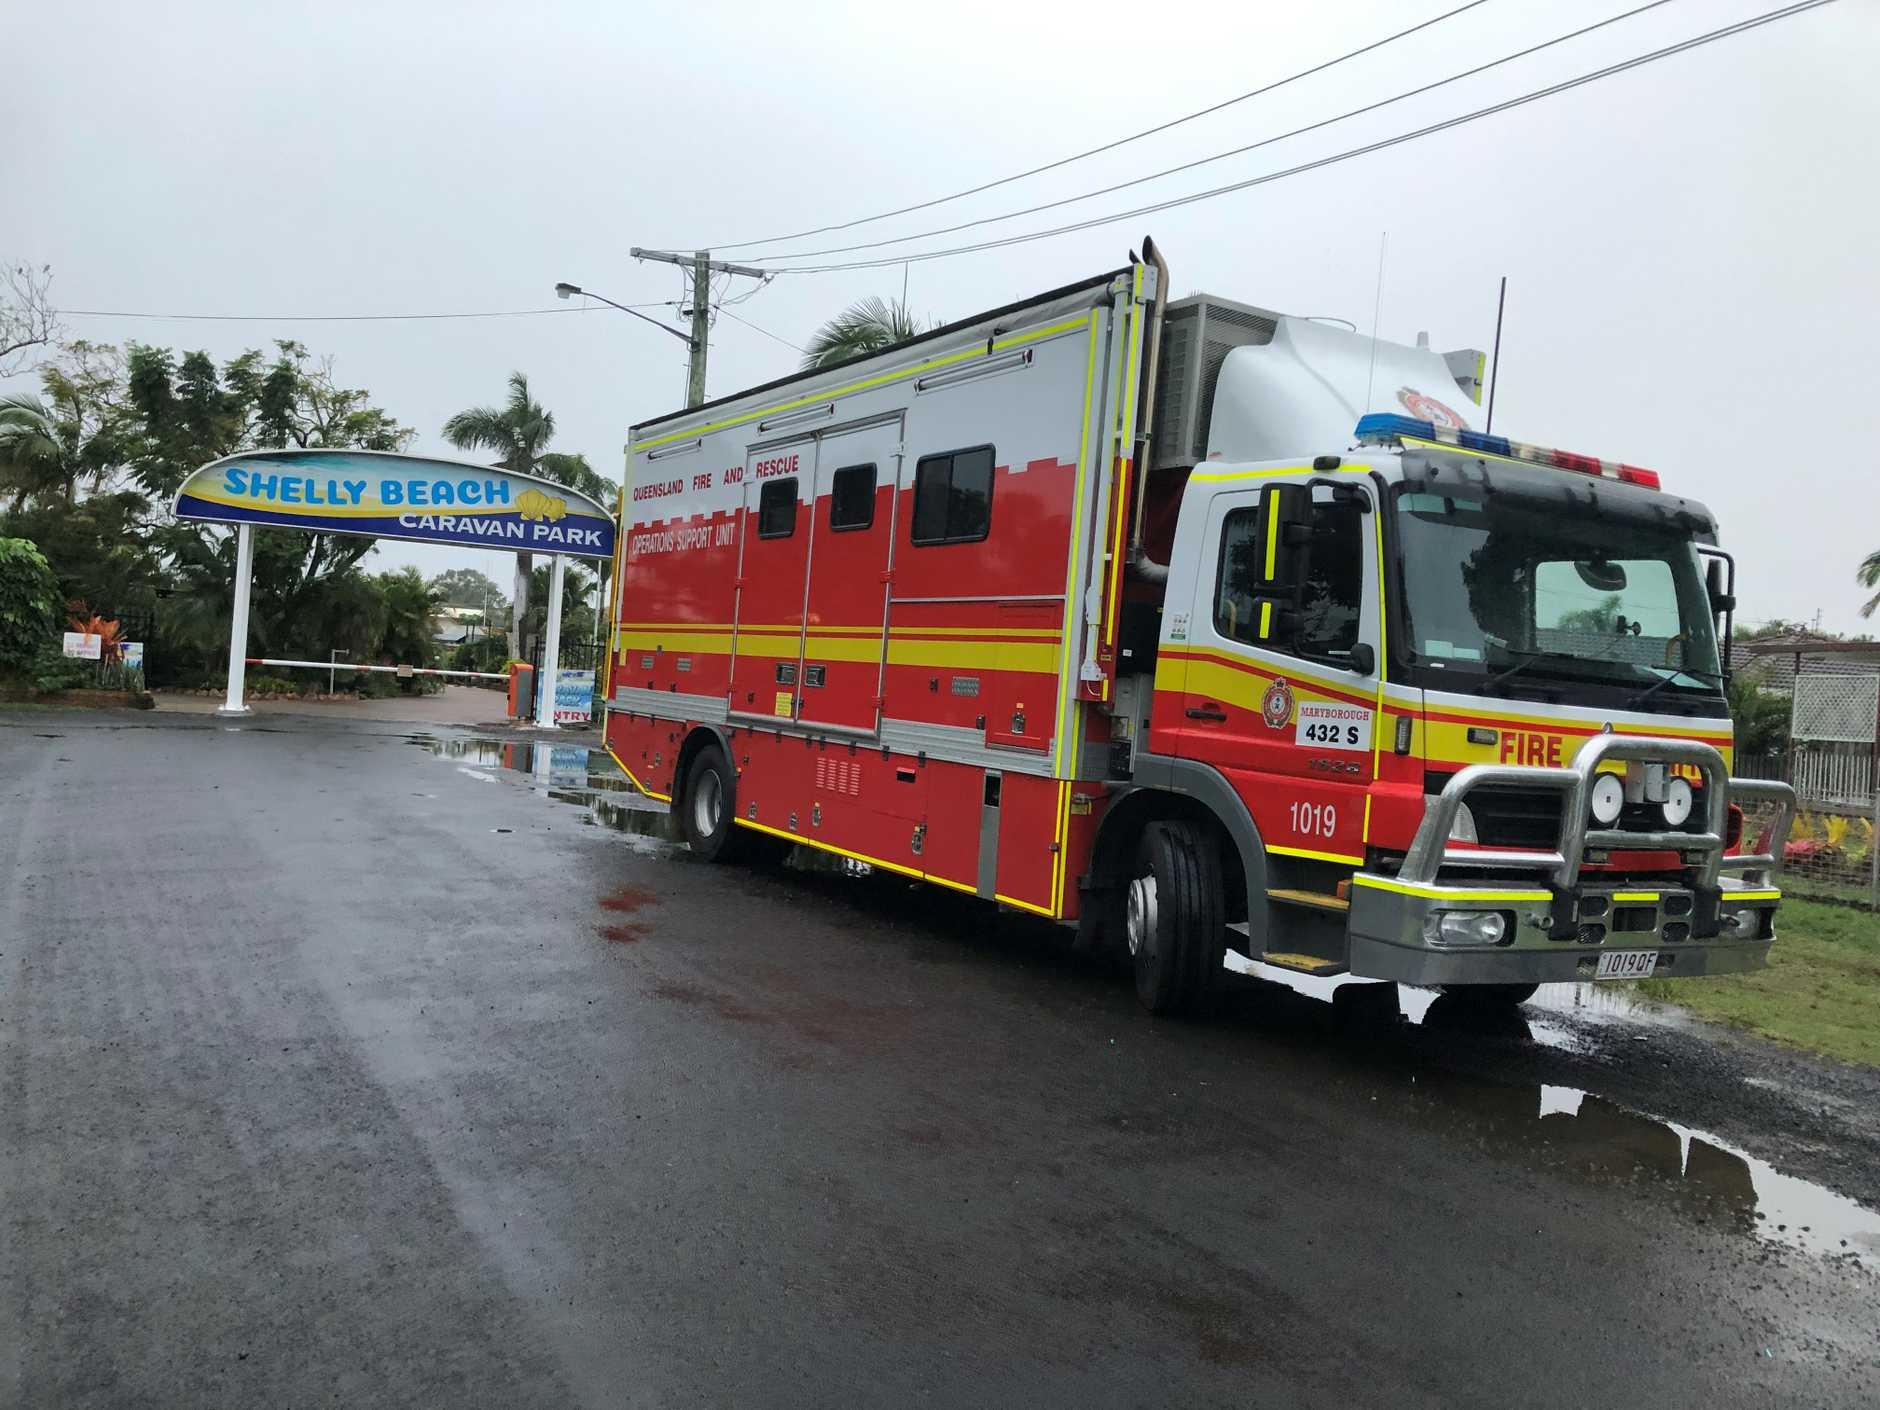 A fire truck outside Shelly Beach Caravan Park.